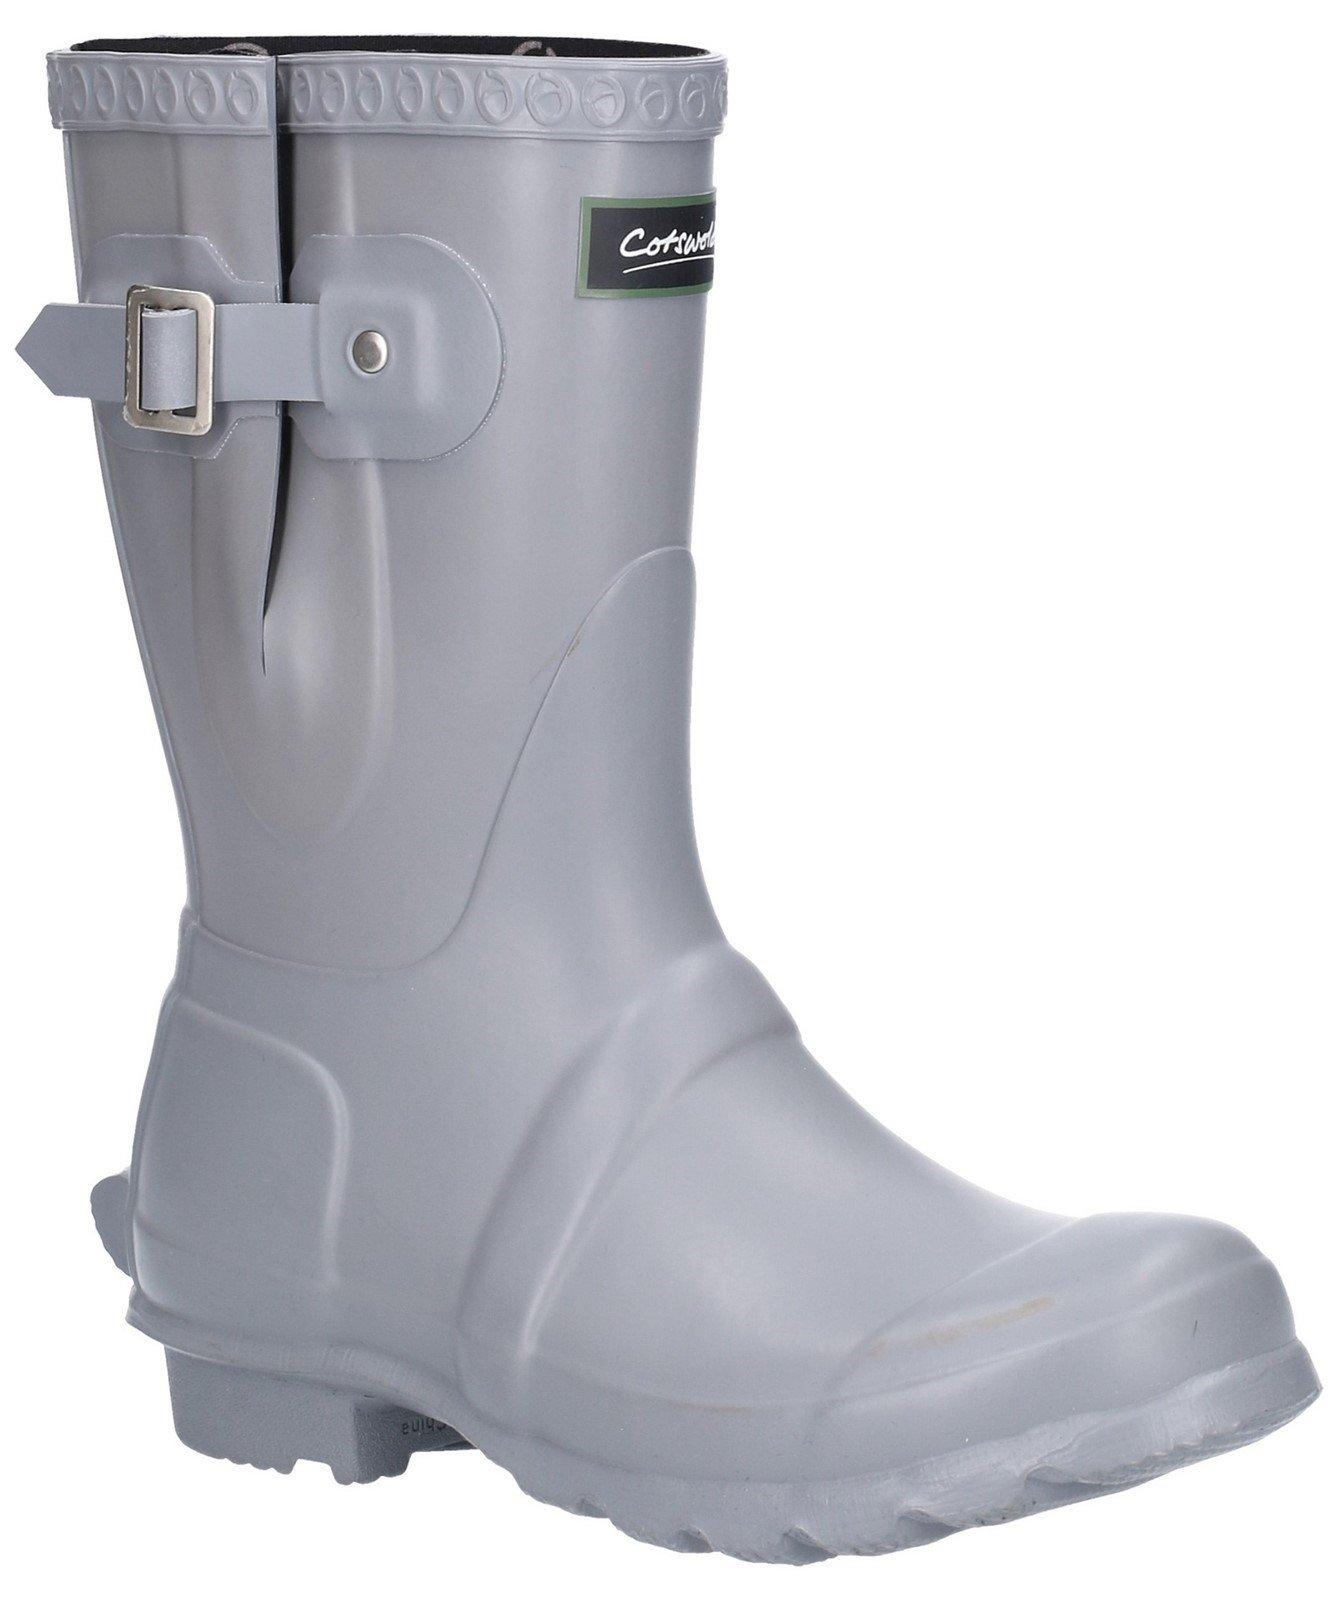 Cotswold Women's Windsor Short Wellington Boot Various Colours 25537 - Slate 3